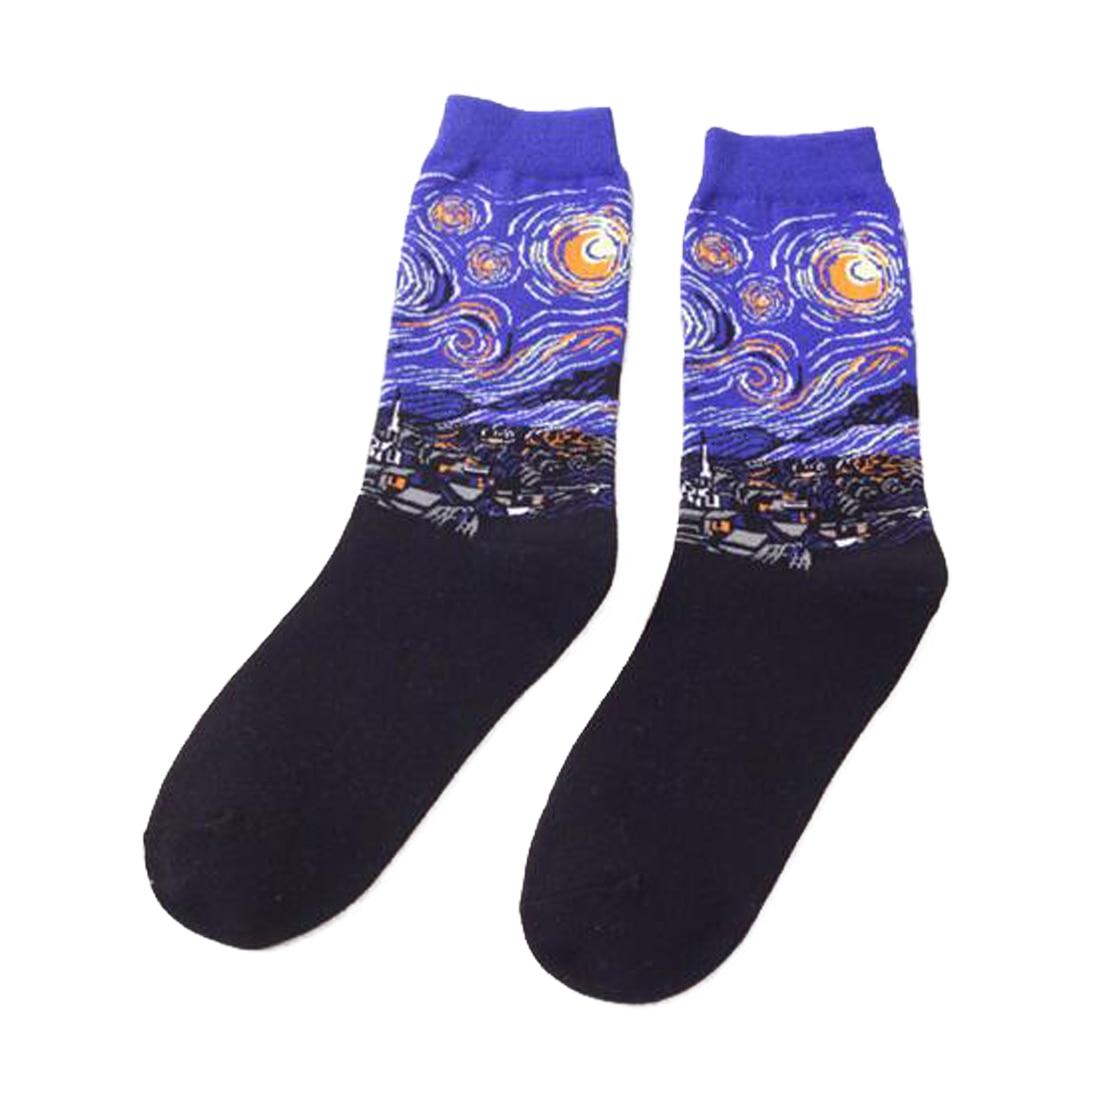 Hot 1 Pair Funny Novelty Starry Night Vintage Retro Women Men Unisex Art Painting Cotton Socks